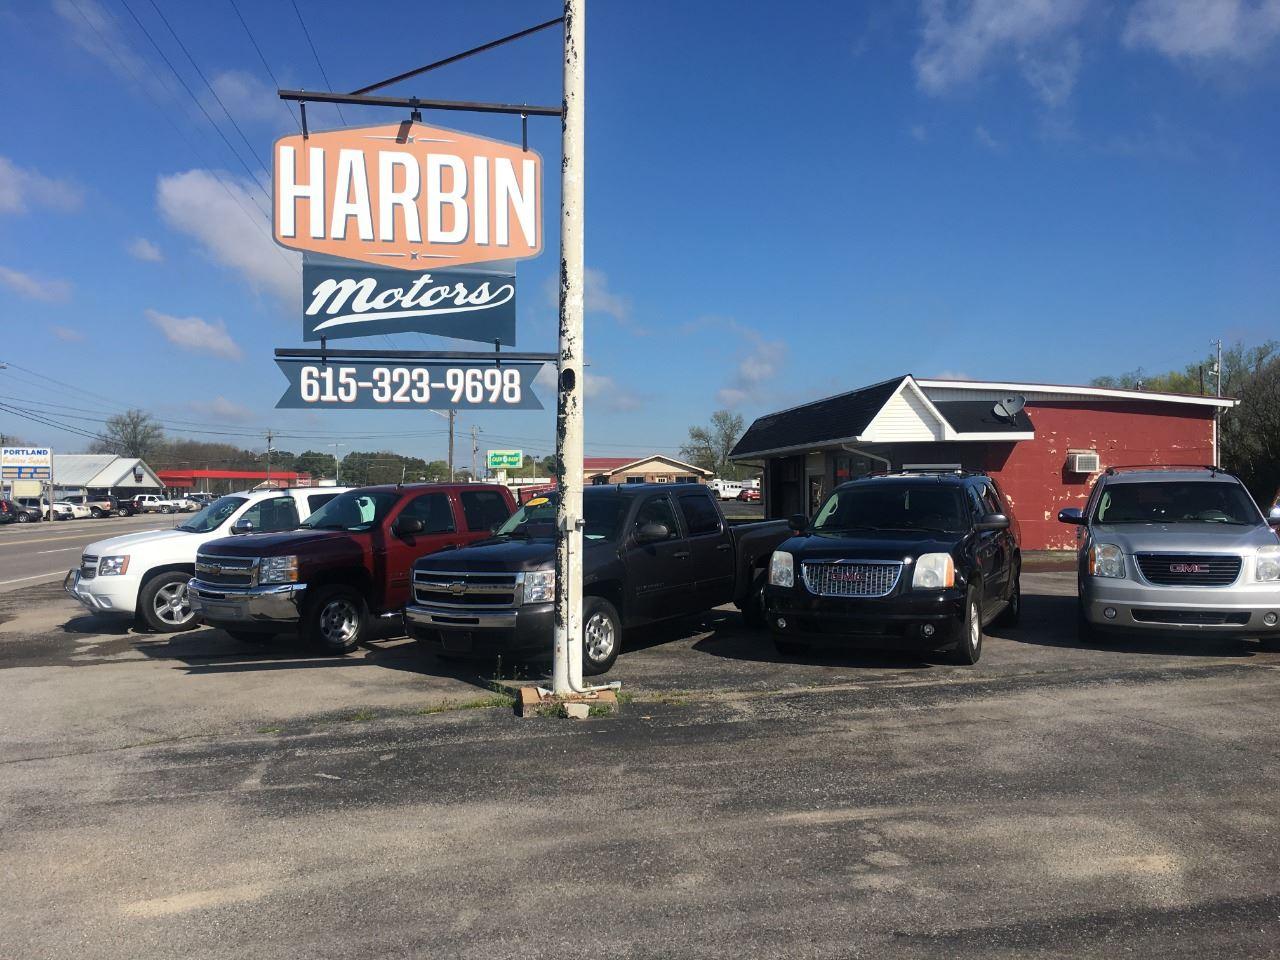 Harbin Motors